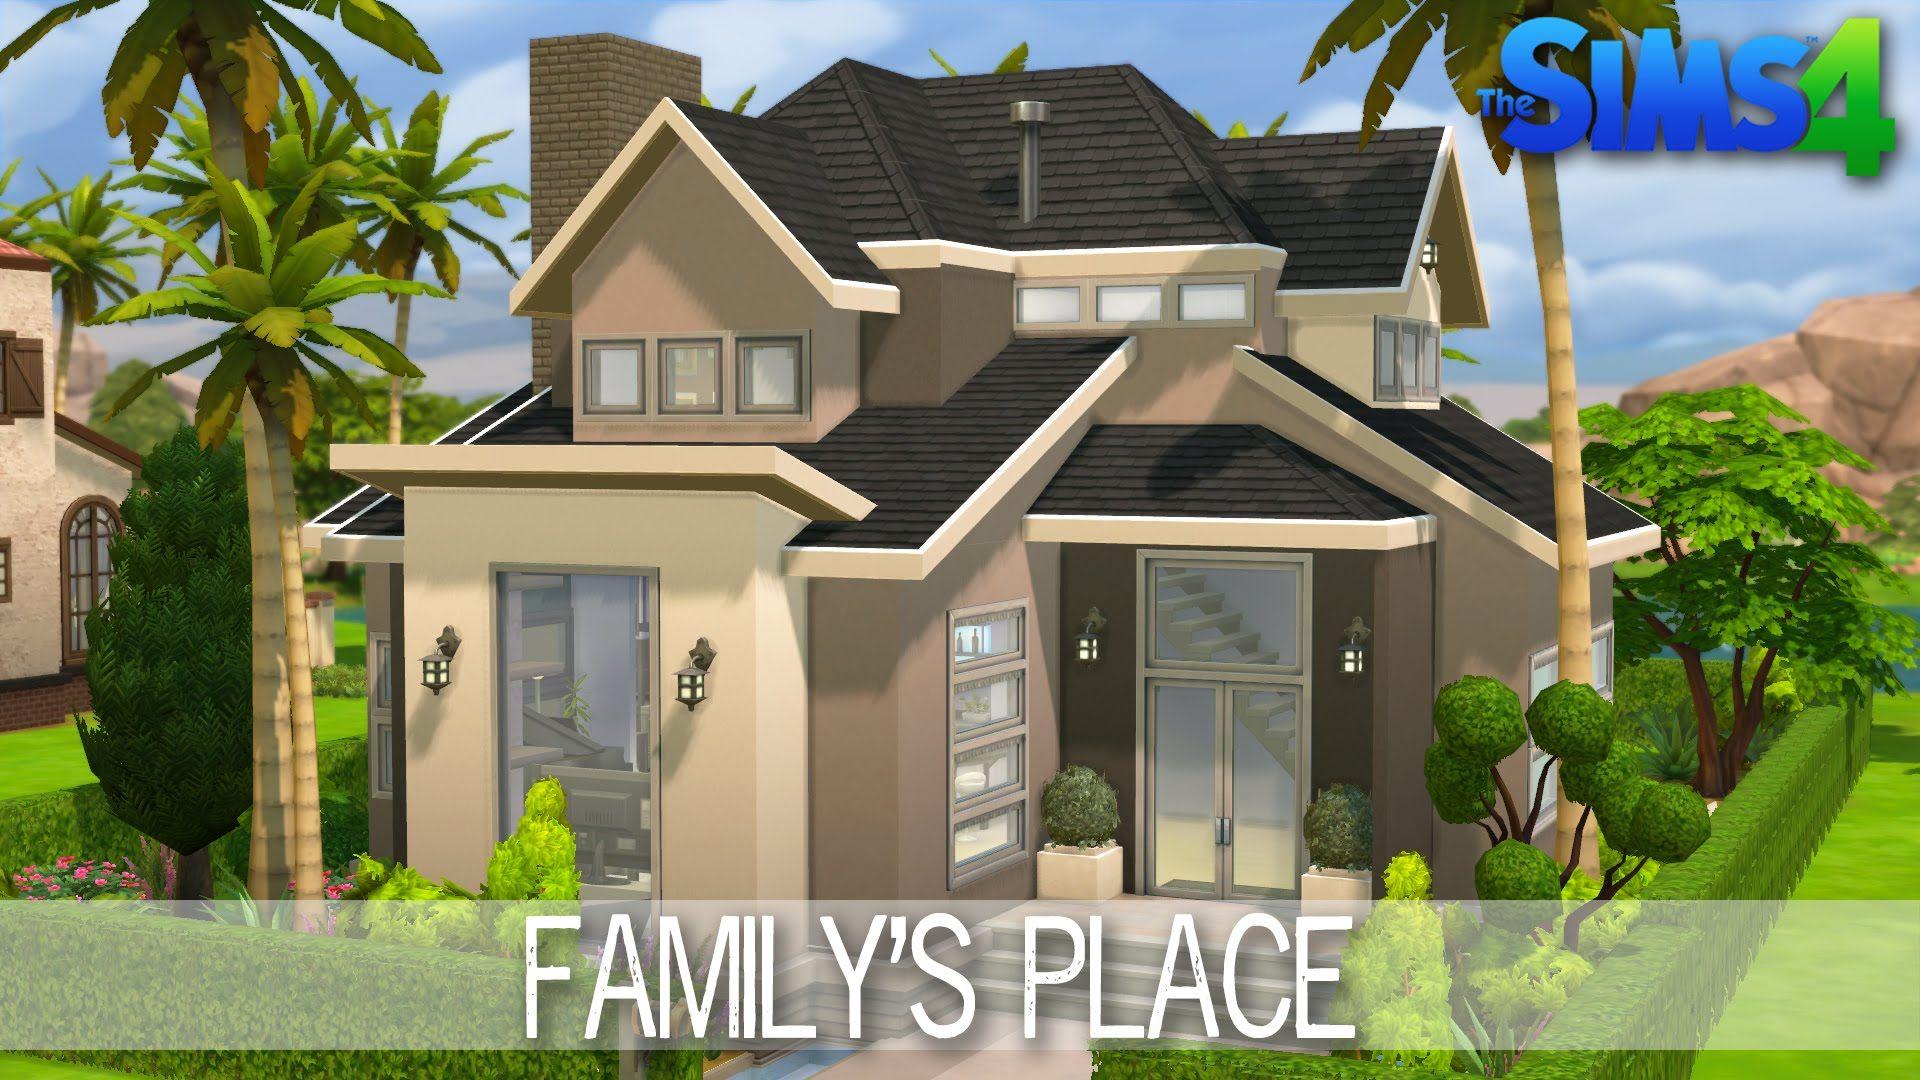 The sims house layout ideas house design ideas pinterest